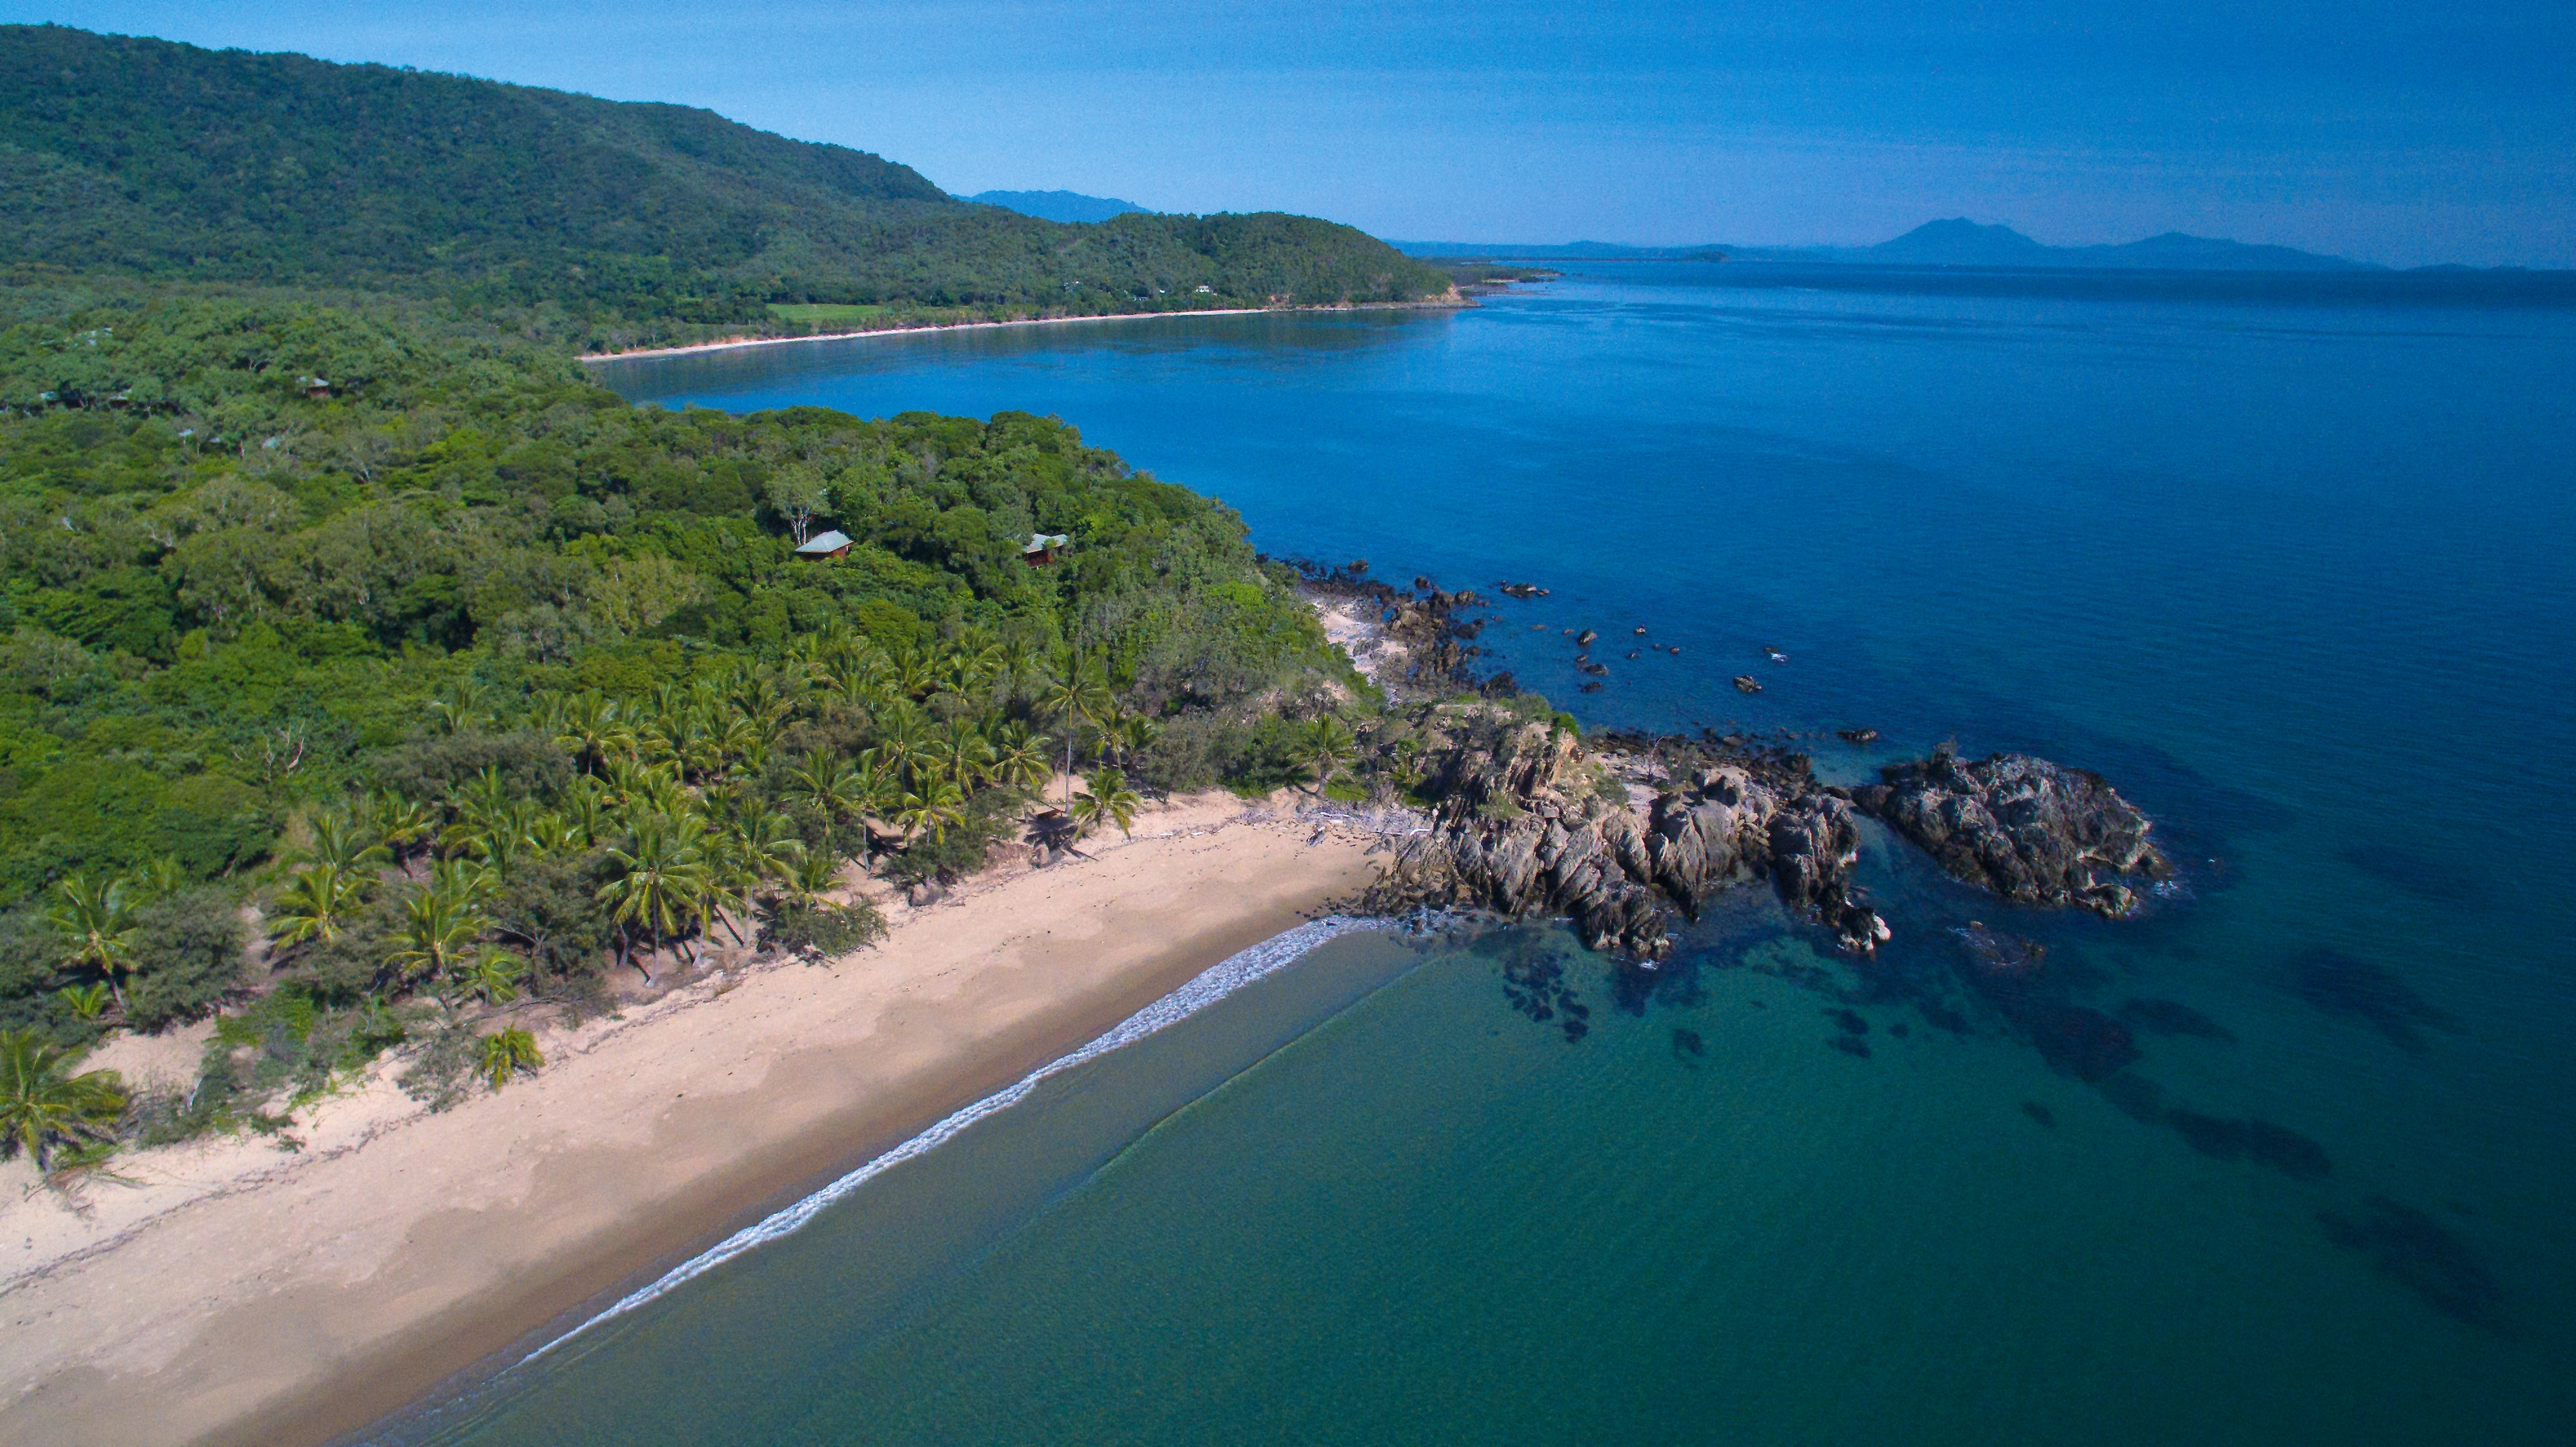 http://www.thalabeach.com.au/wp-content/uploads/2010/07/Thala_Beach_Nature_Reserve_2016__175.jpg